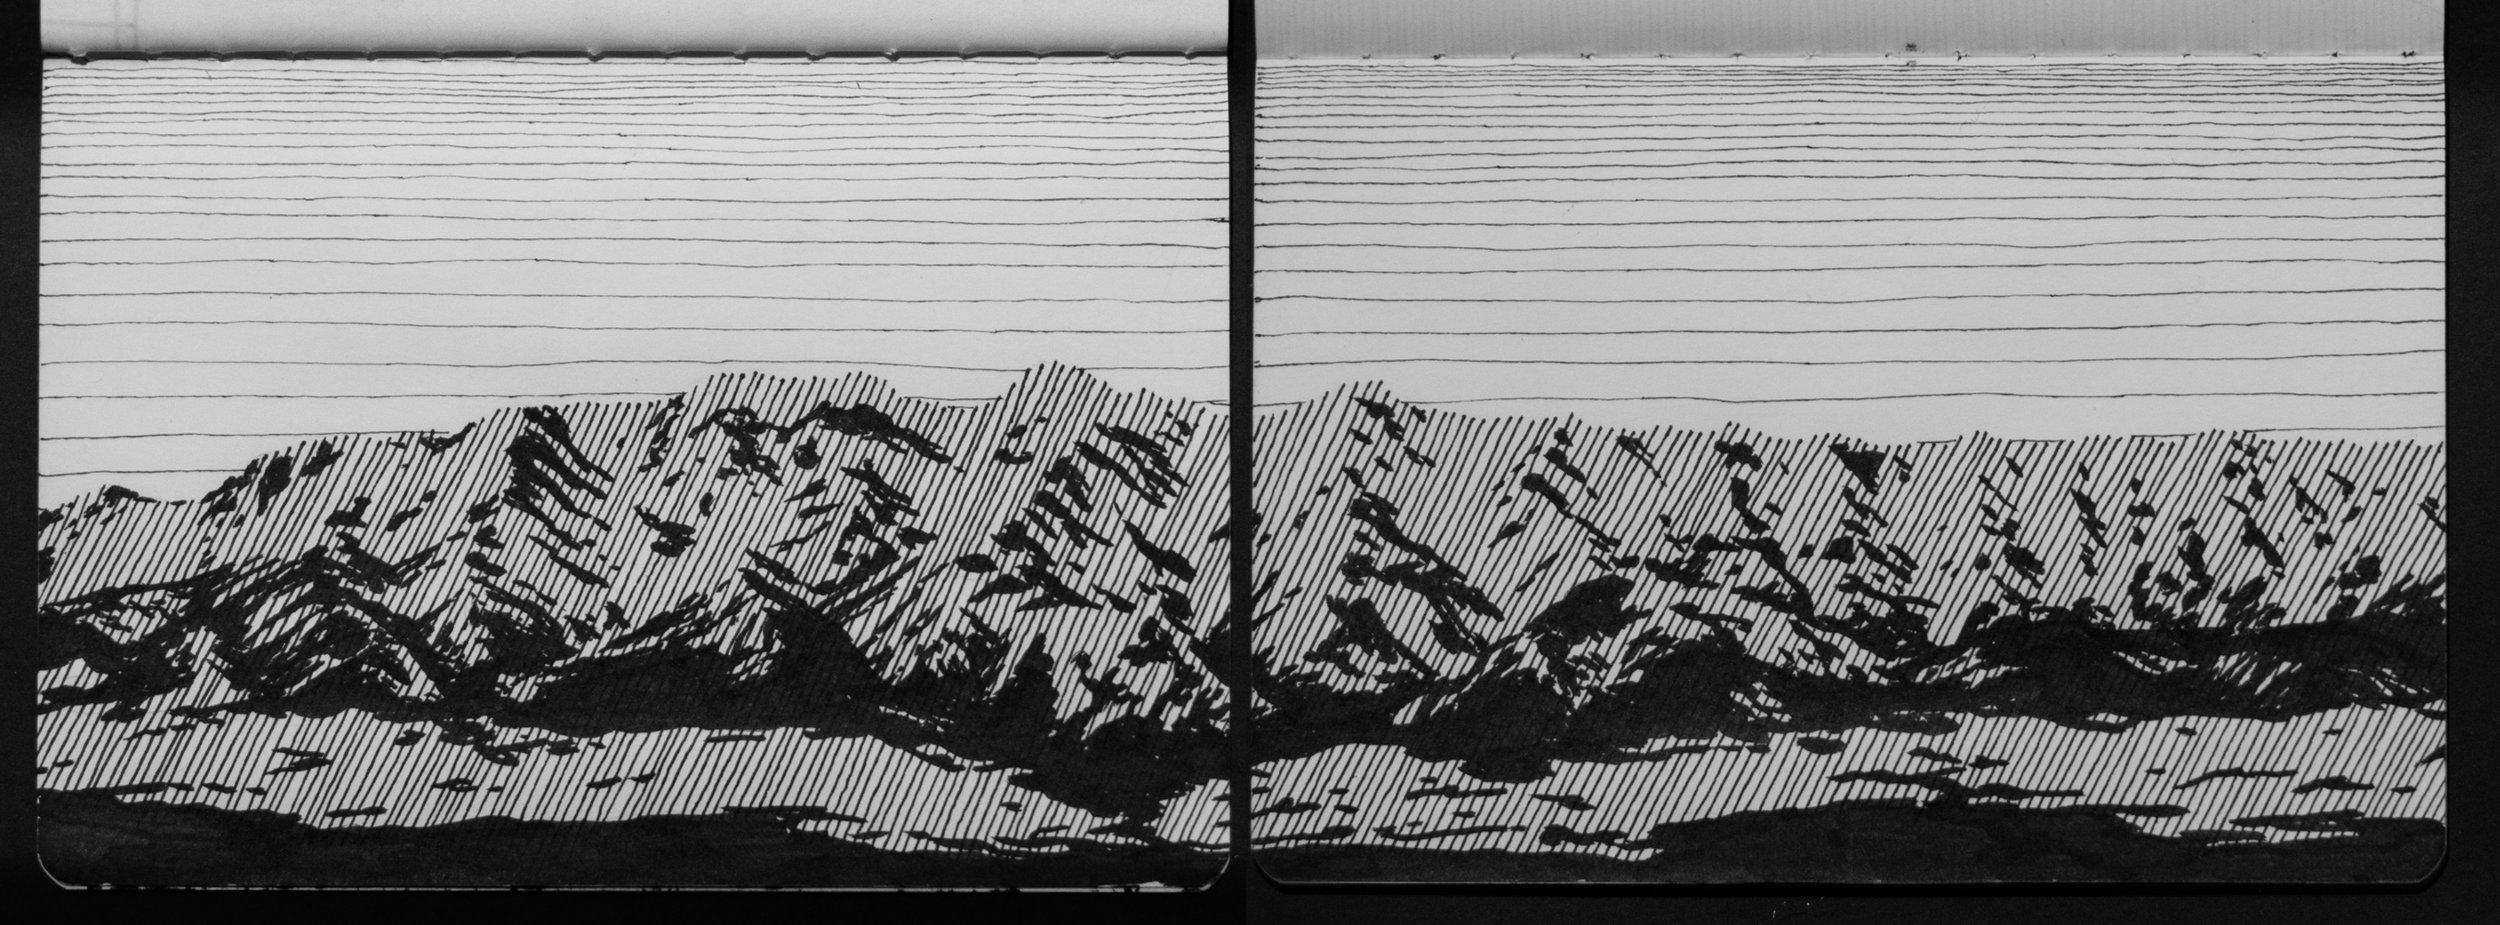 04-10 Wellsville Mountains Pano F.jpg